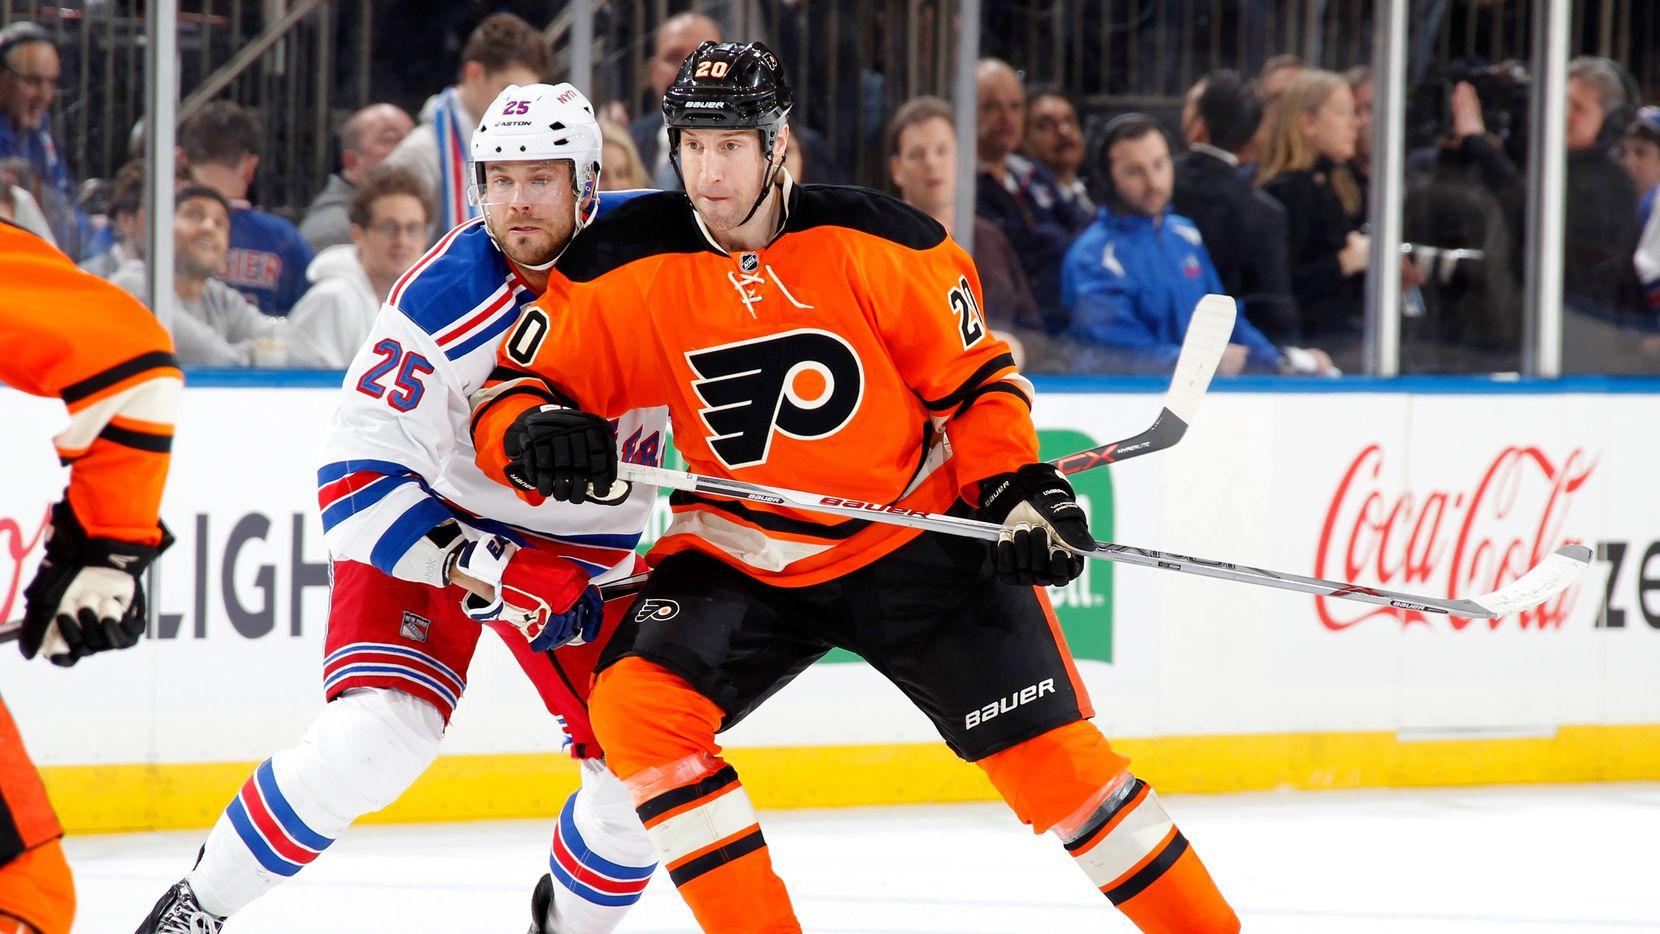 NEW YORK, NY - FEBRUARY 14:  R.J. Umberger #20 of the Philadelphia Flyers skates against Viktor Stalberg #25 of the New York Rangers at Madison Square Garden on February 14, 2016 in New York City. The New York Rangers won 3-1. (Photo by Jared Silber/NHLI via Getty Images)